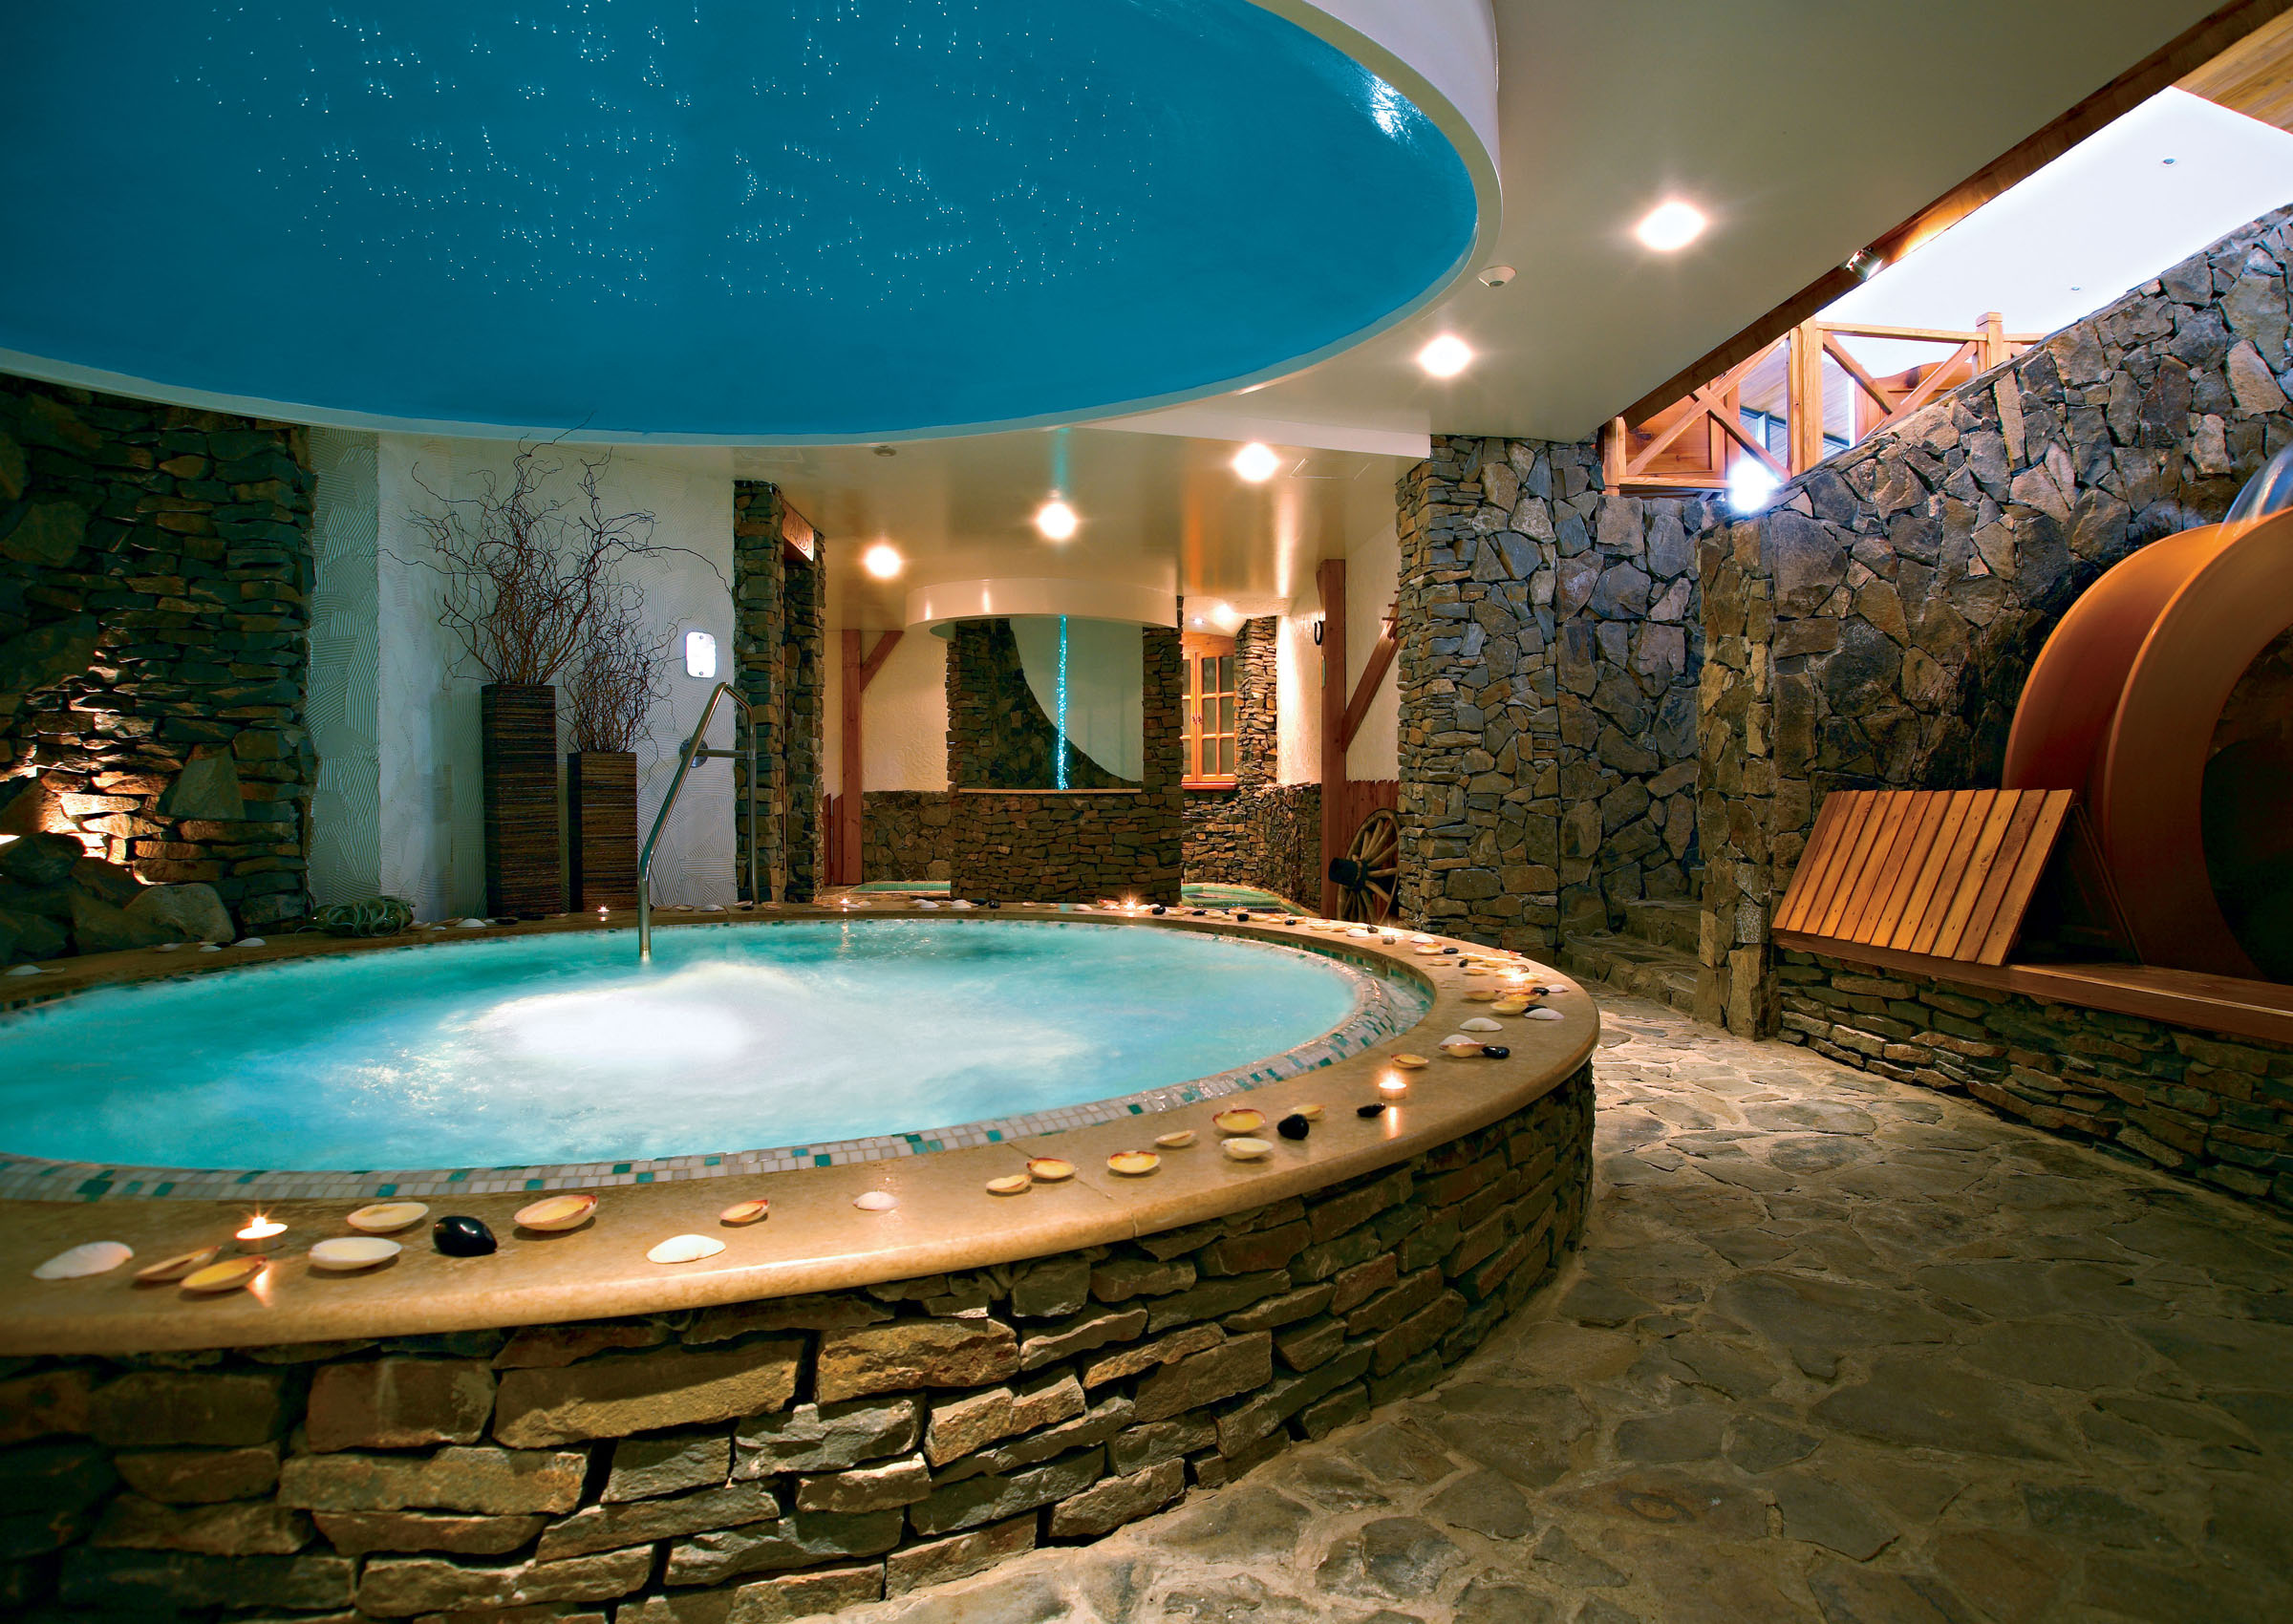 Kontakt wellness hotel sothys for Wellness hotel